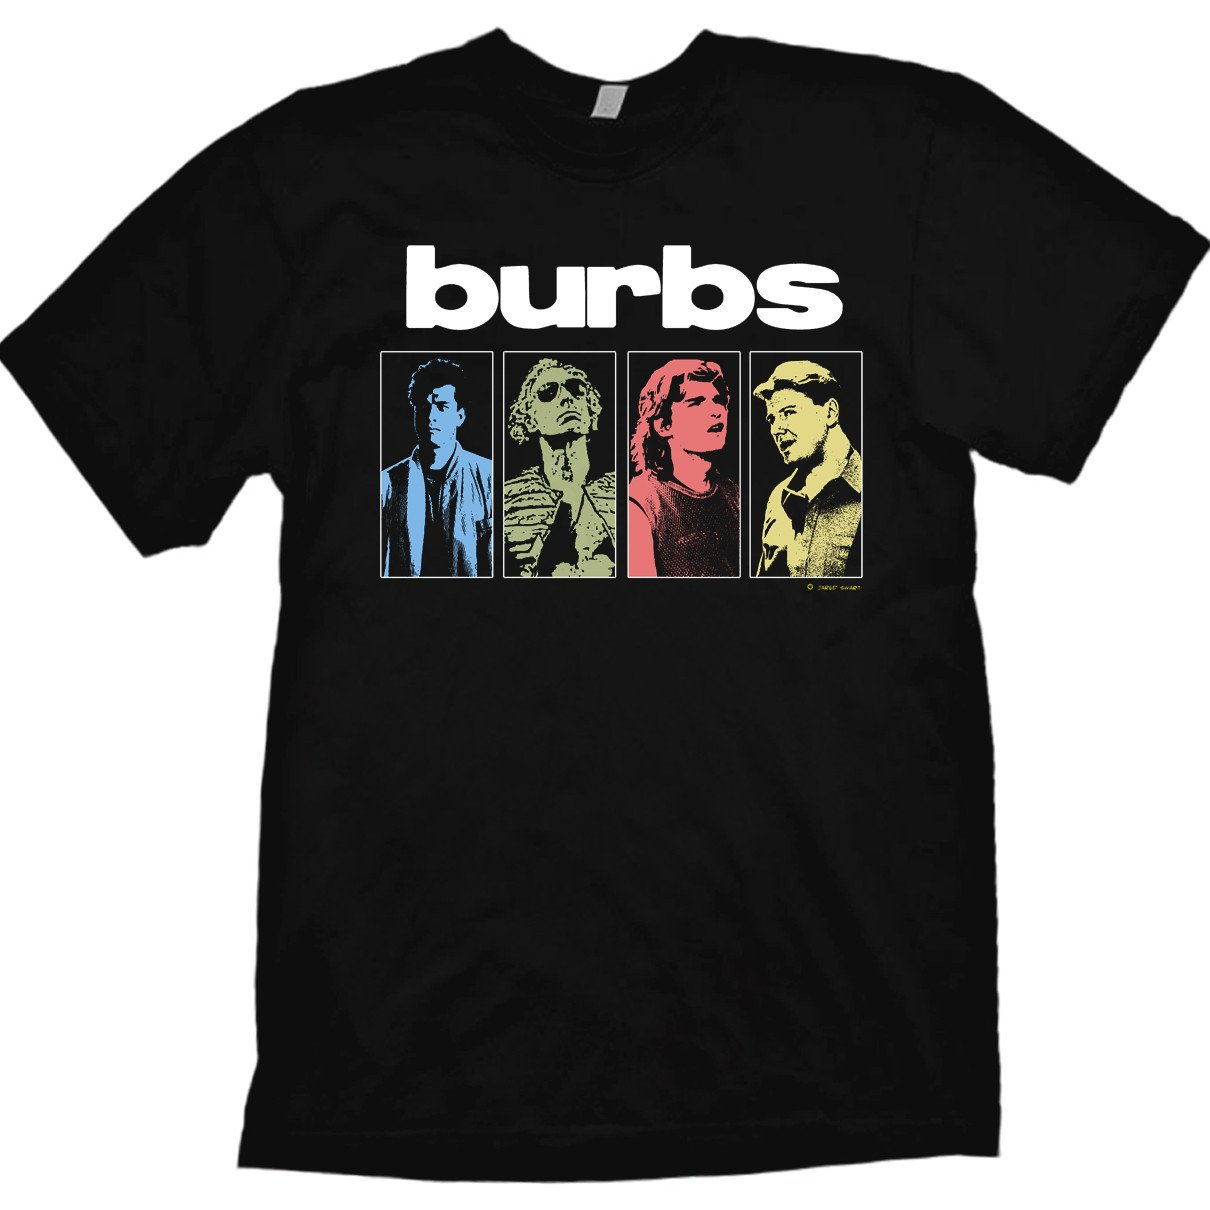 T Shirt Design Business Near Me: Amazon.com: The 7Burbs T-Shirt Pop Art Design #1 by Jared Swart rh:amazon.com,Design